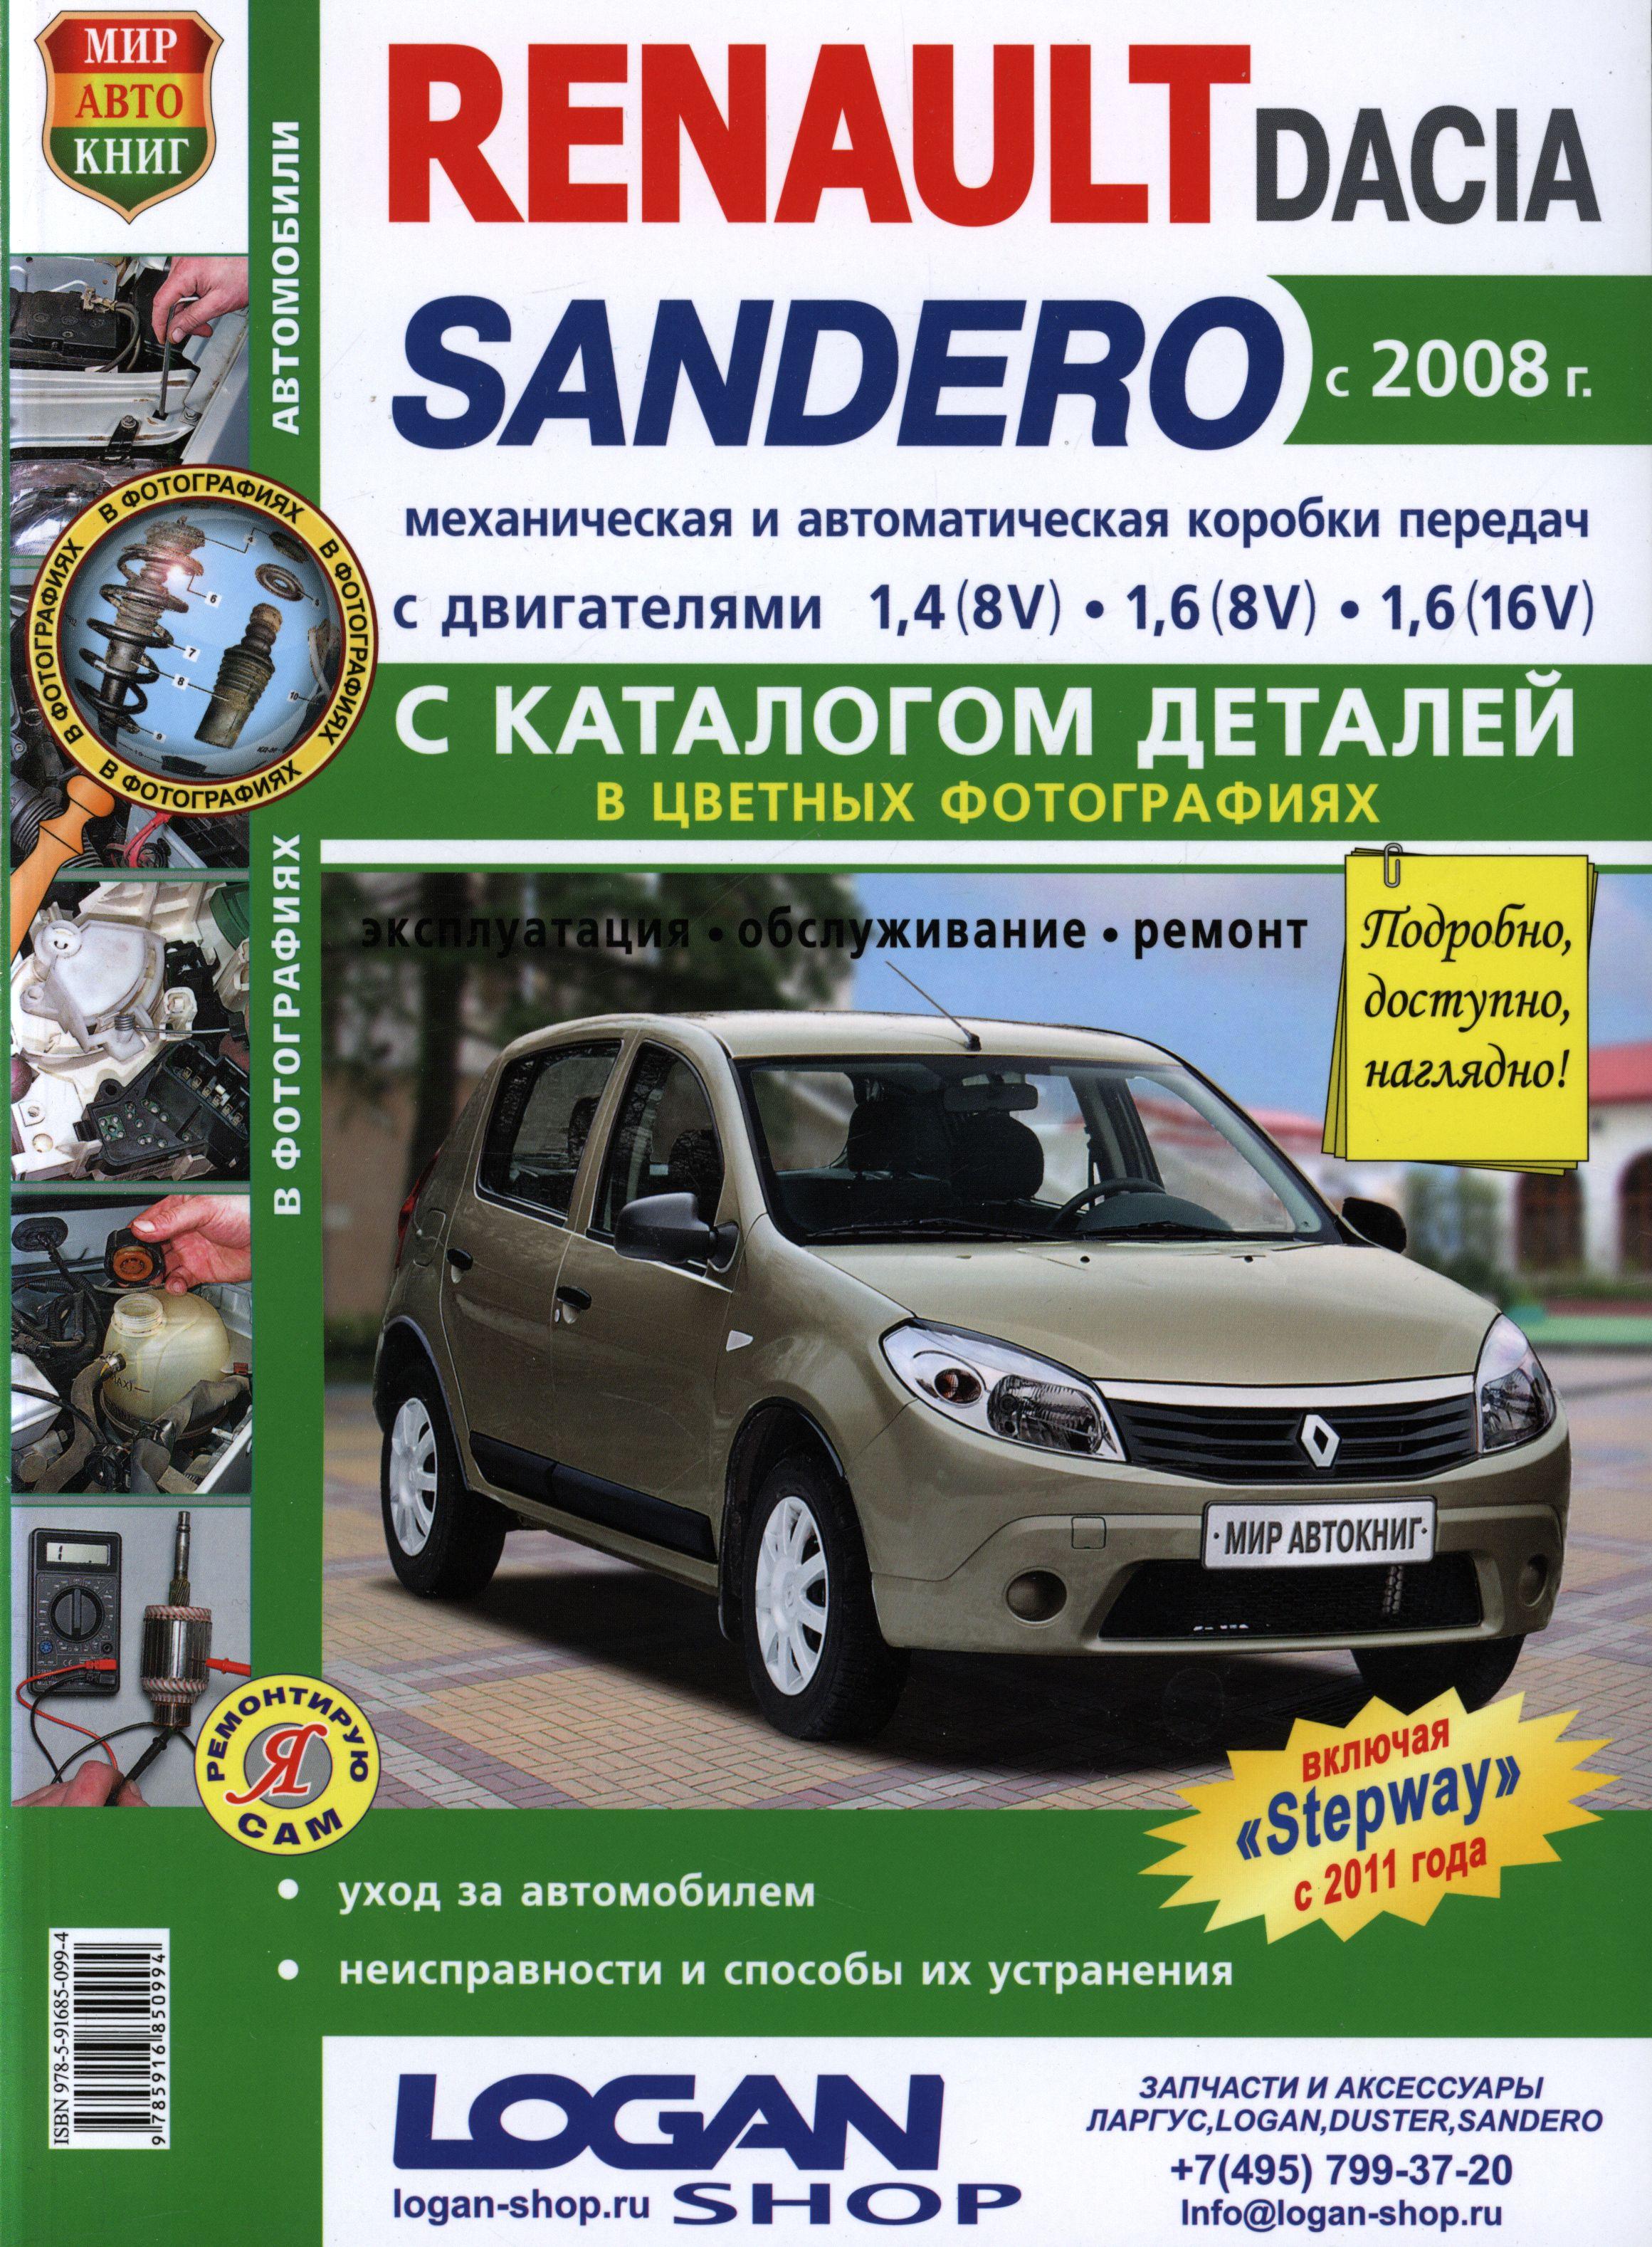 руководство по эксплуатации рено сандеро 2011